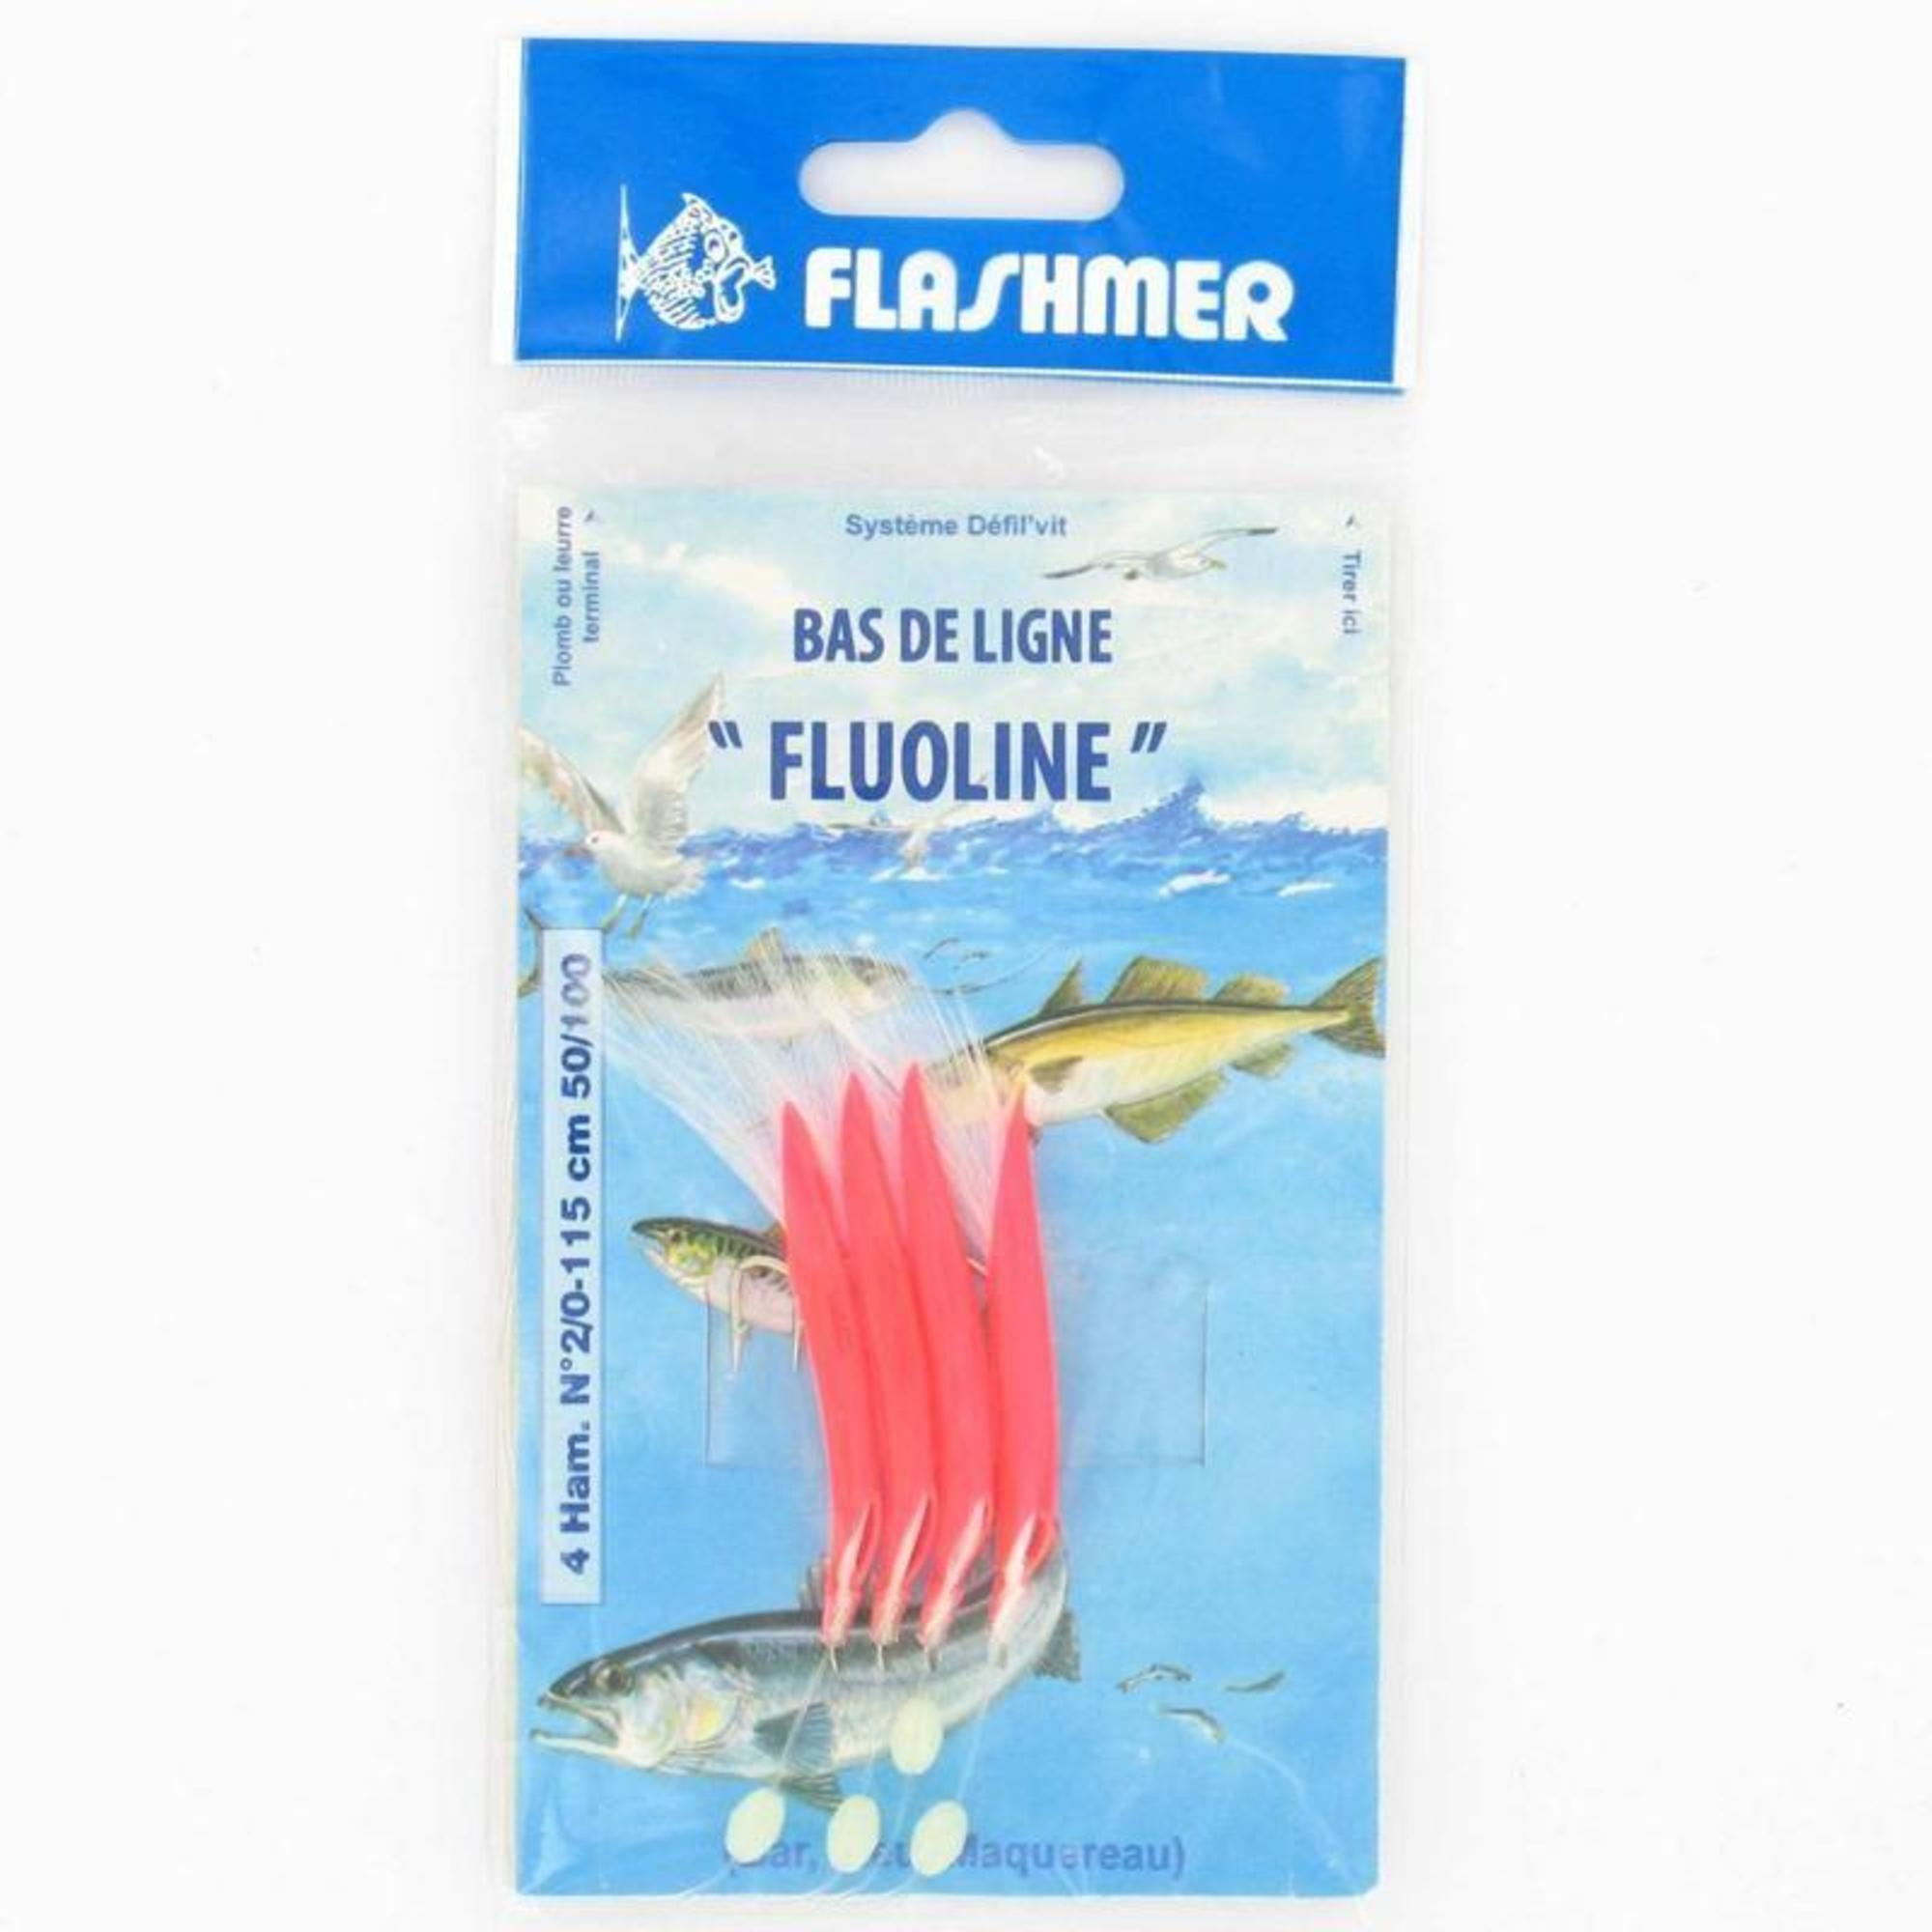 Flashmer Spinnersveren Zeevissen Fluoline 4 Haken Nr20 Decathlon